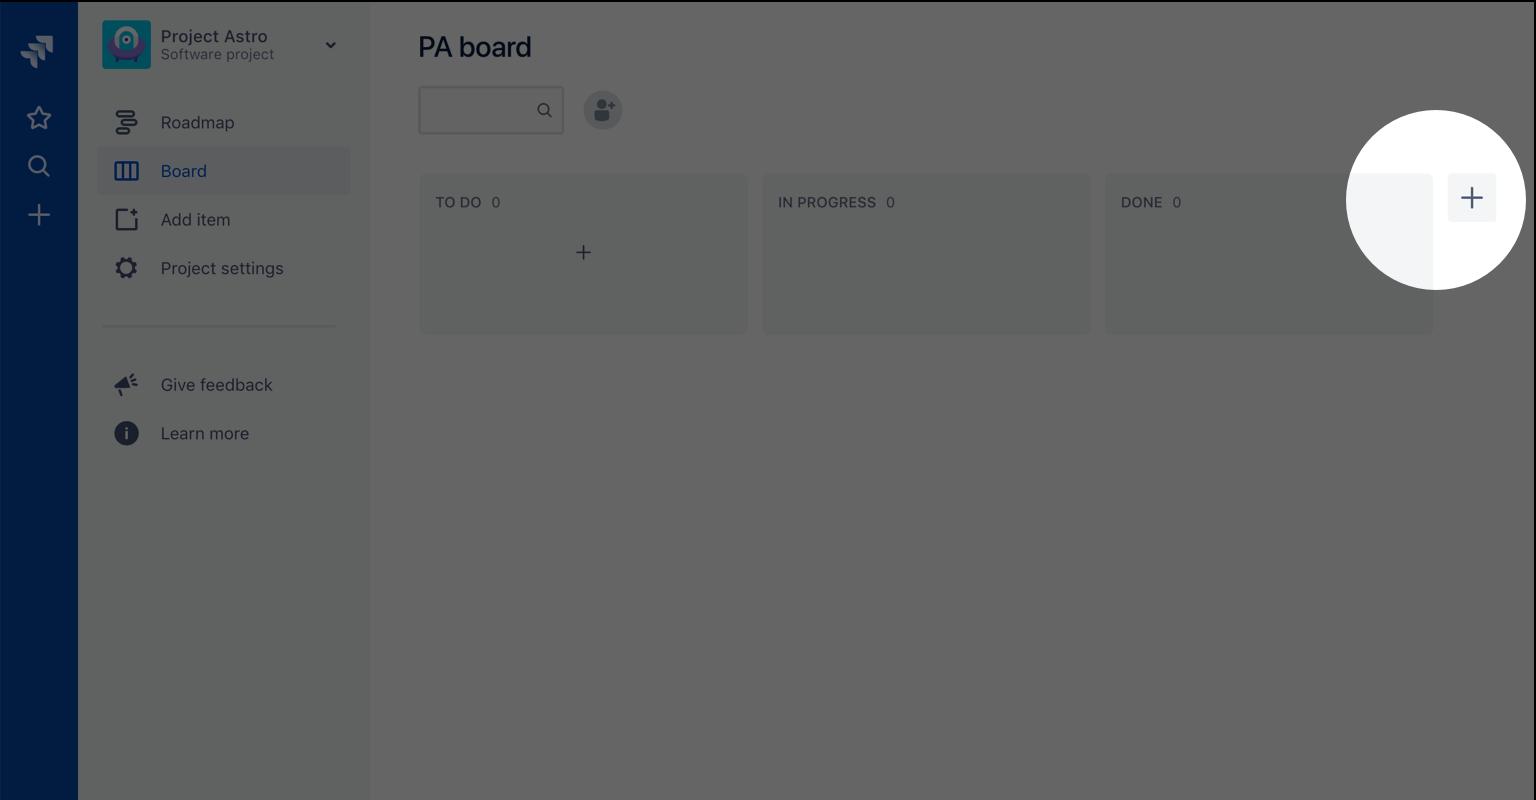 Снимок экрана, на котором подсвечена кнопка добавления столбца